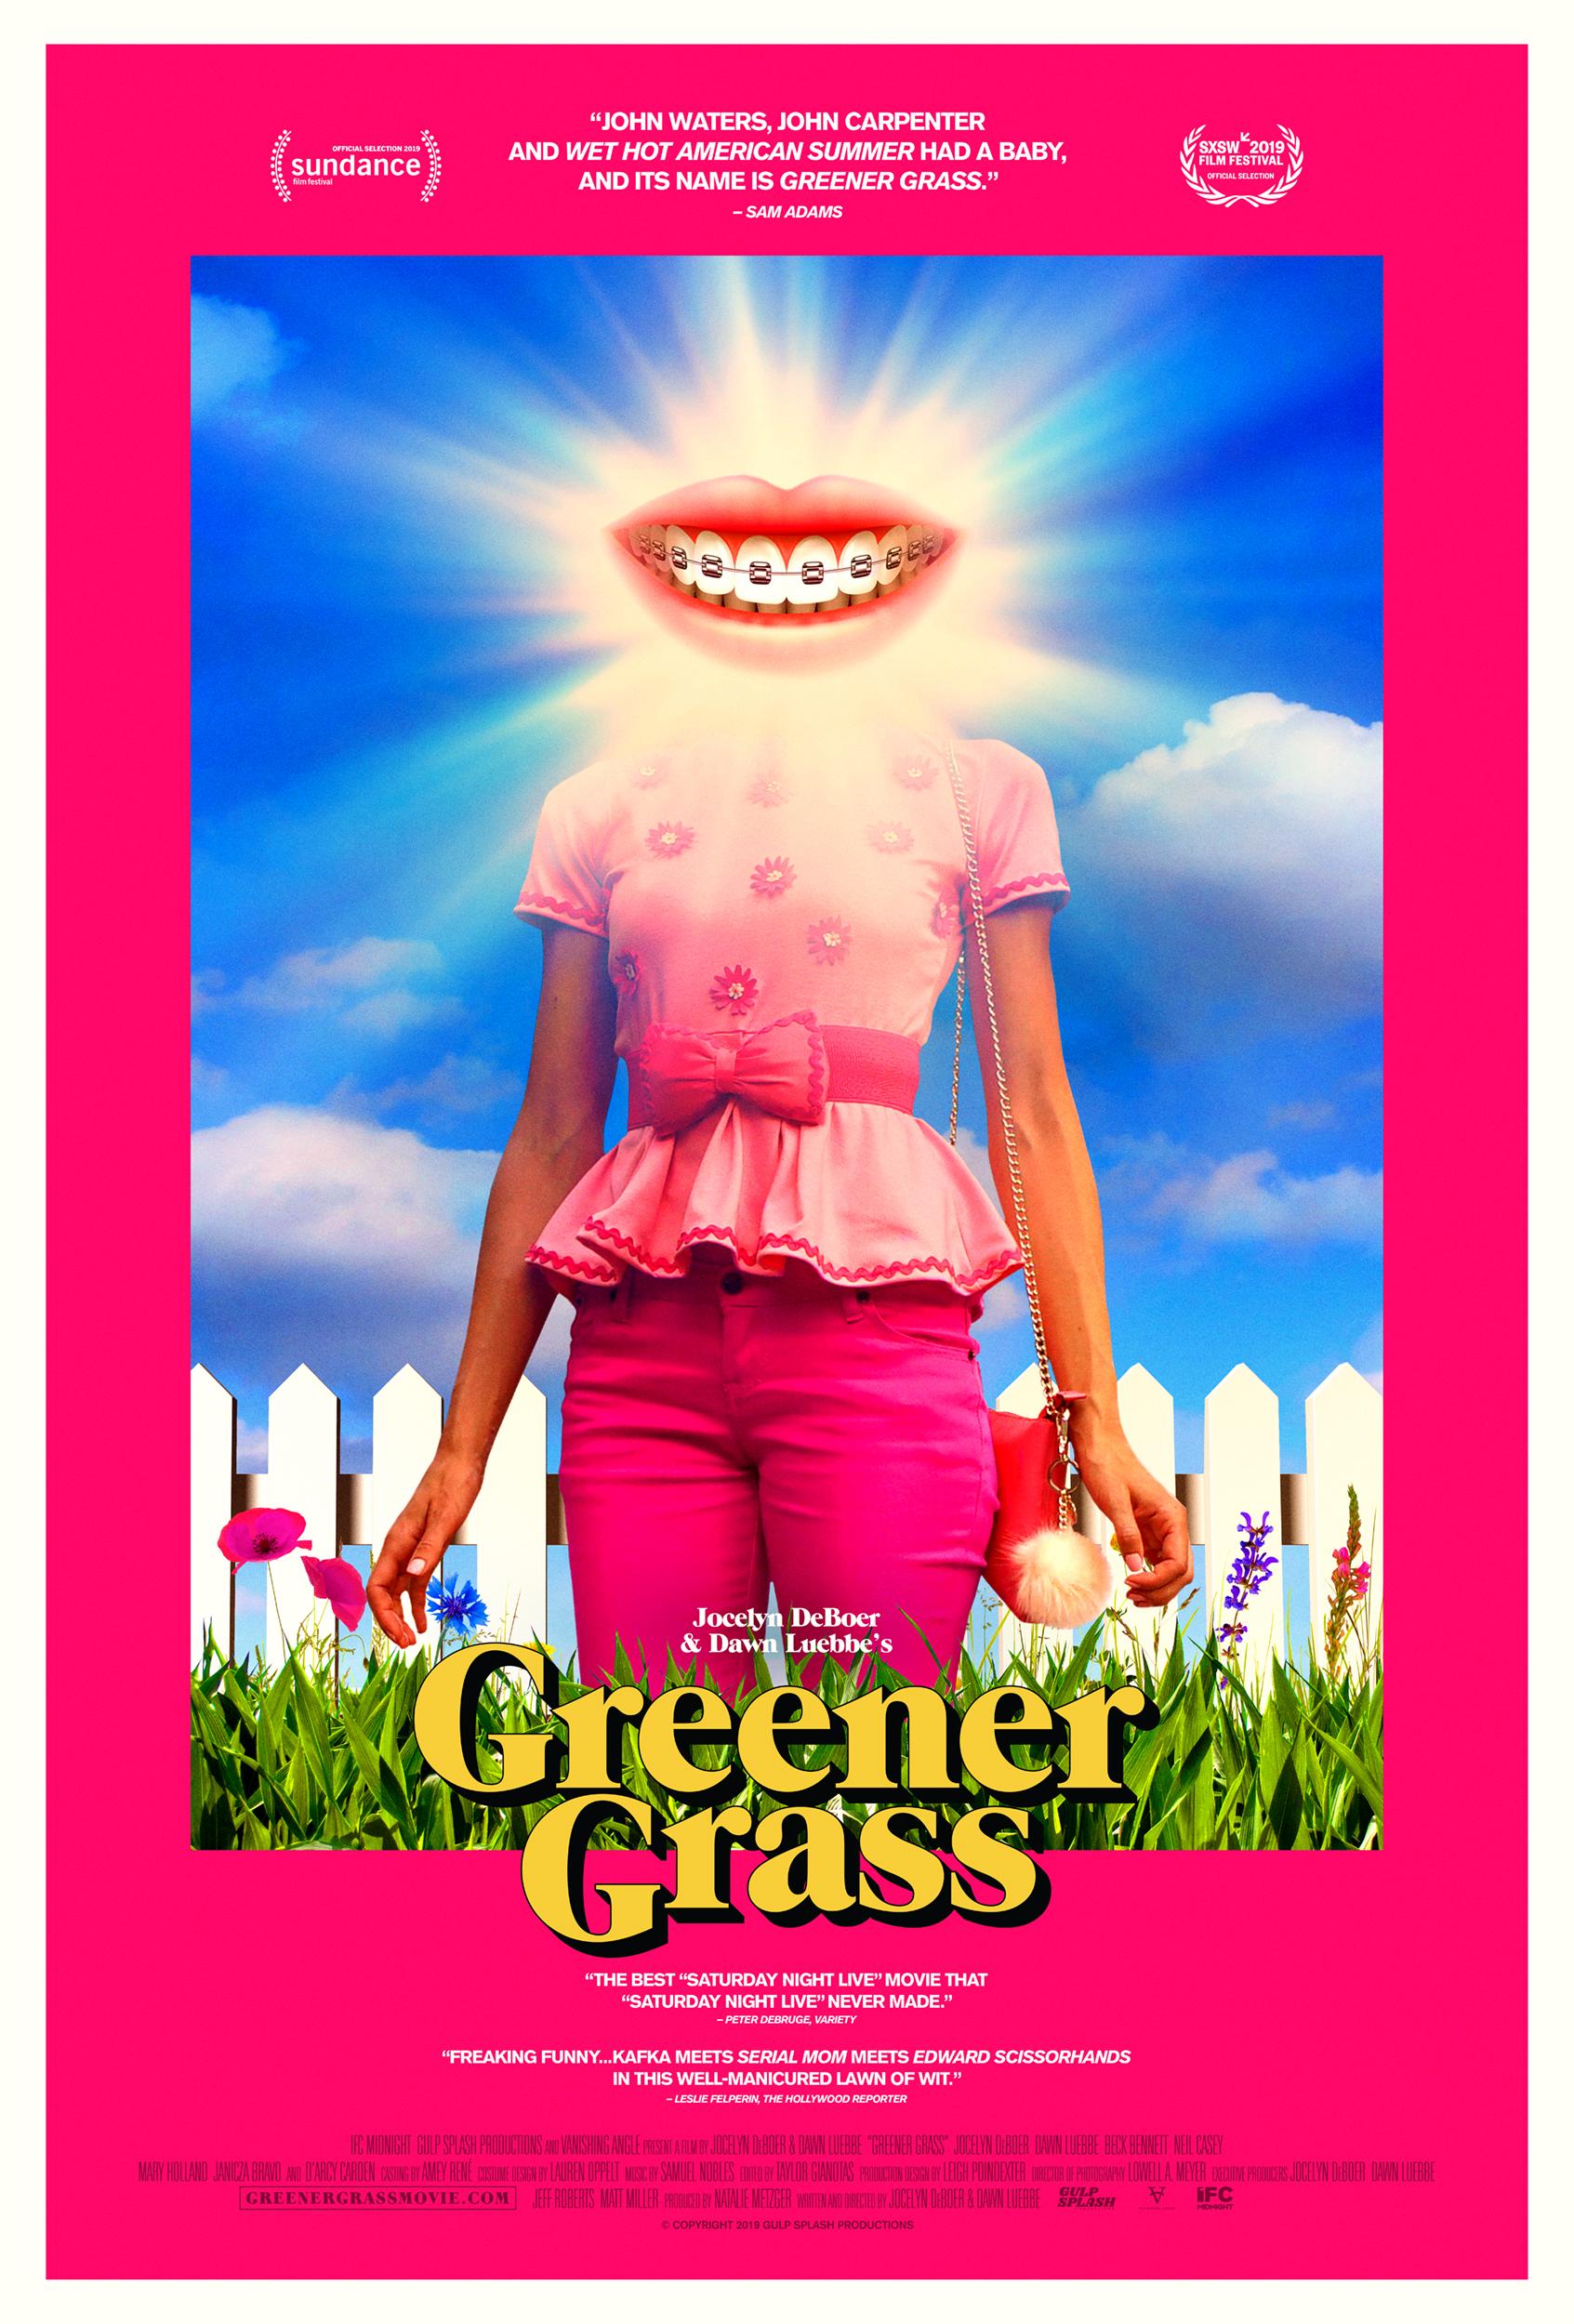 the grass is always greener movie